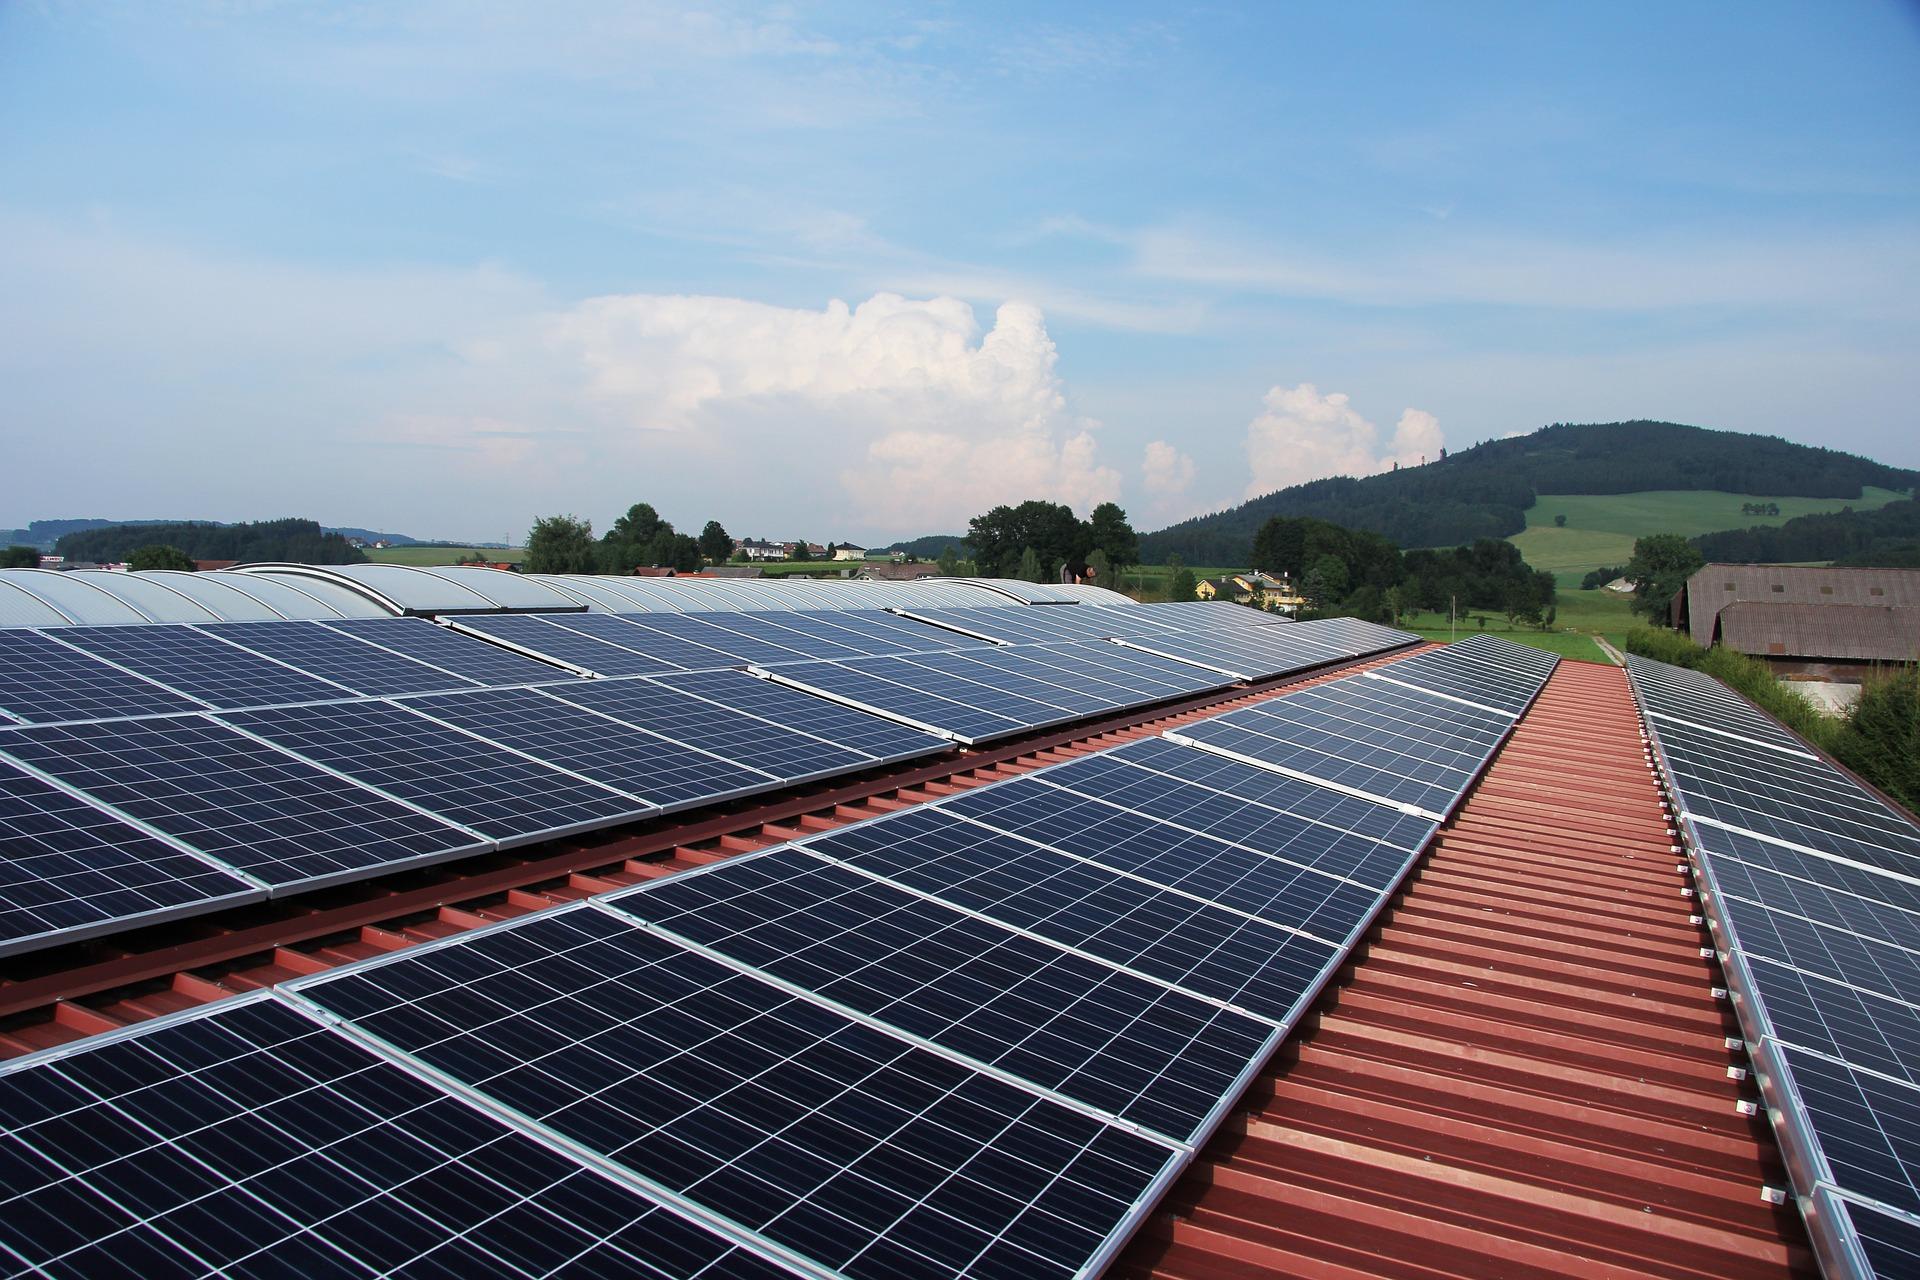 solar-power-862602_1920 (1).jpg